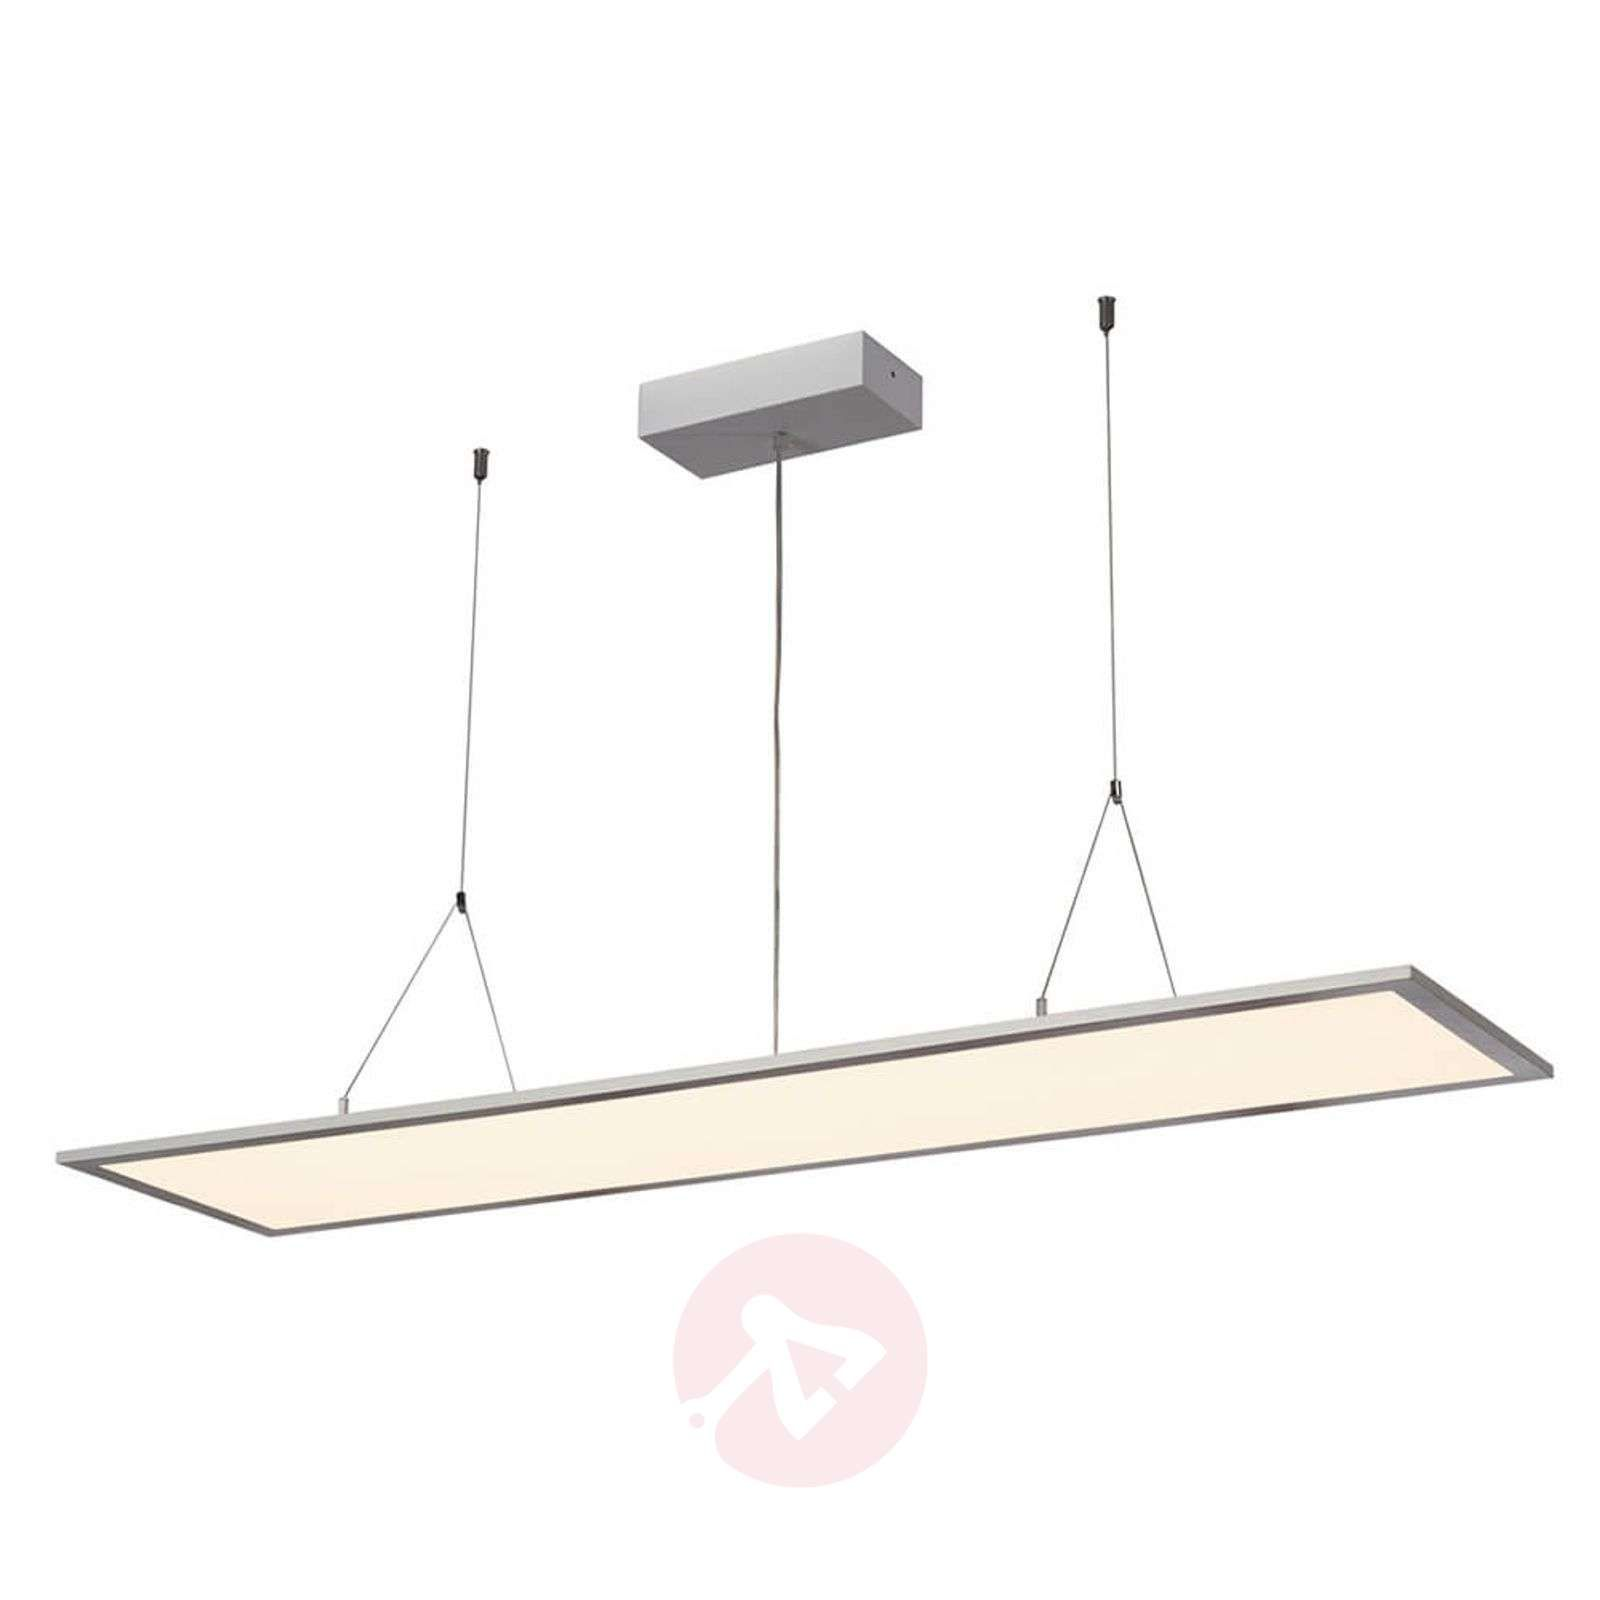 Lampa Loft Vintage Rio Lampa Wiszaca Kula Szklana Lampa Salon Cosmetica Nowoczesne Lampy Wiszace Nowoczesne Lampy Sufitowe Ledowe Led Lamp Home Decor